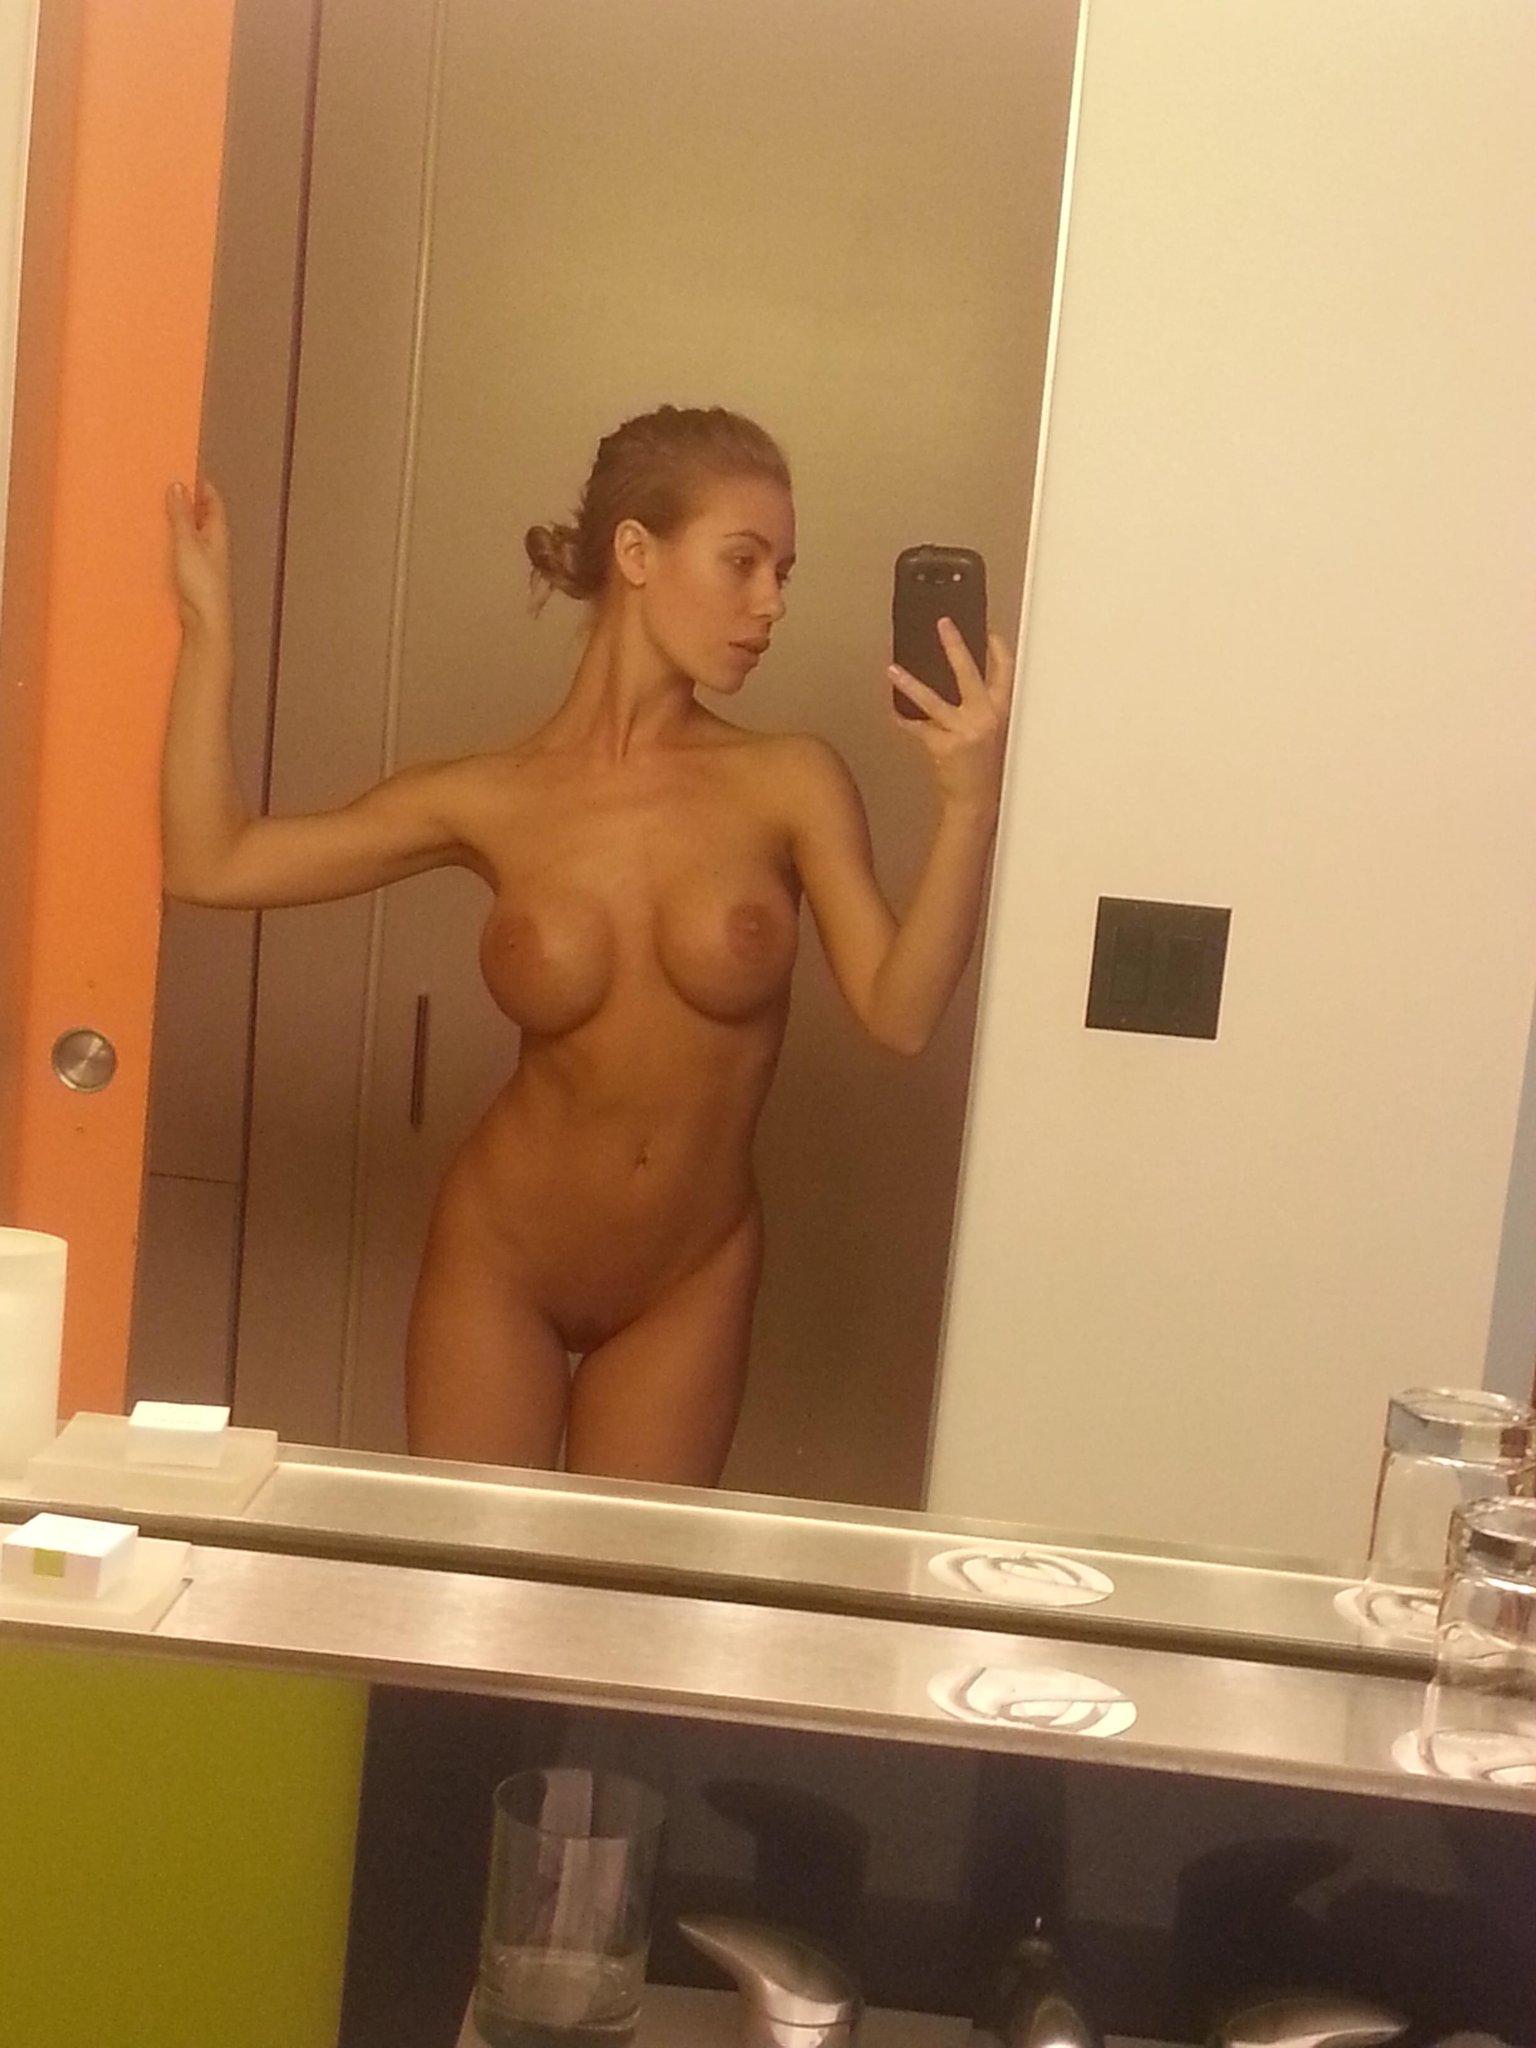 Nicole Aniston on Twitter nsfw fitordie nomakeup lazypleasesendsnacks httptcogqpHSwfg1p